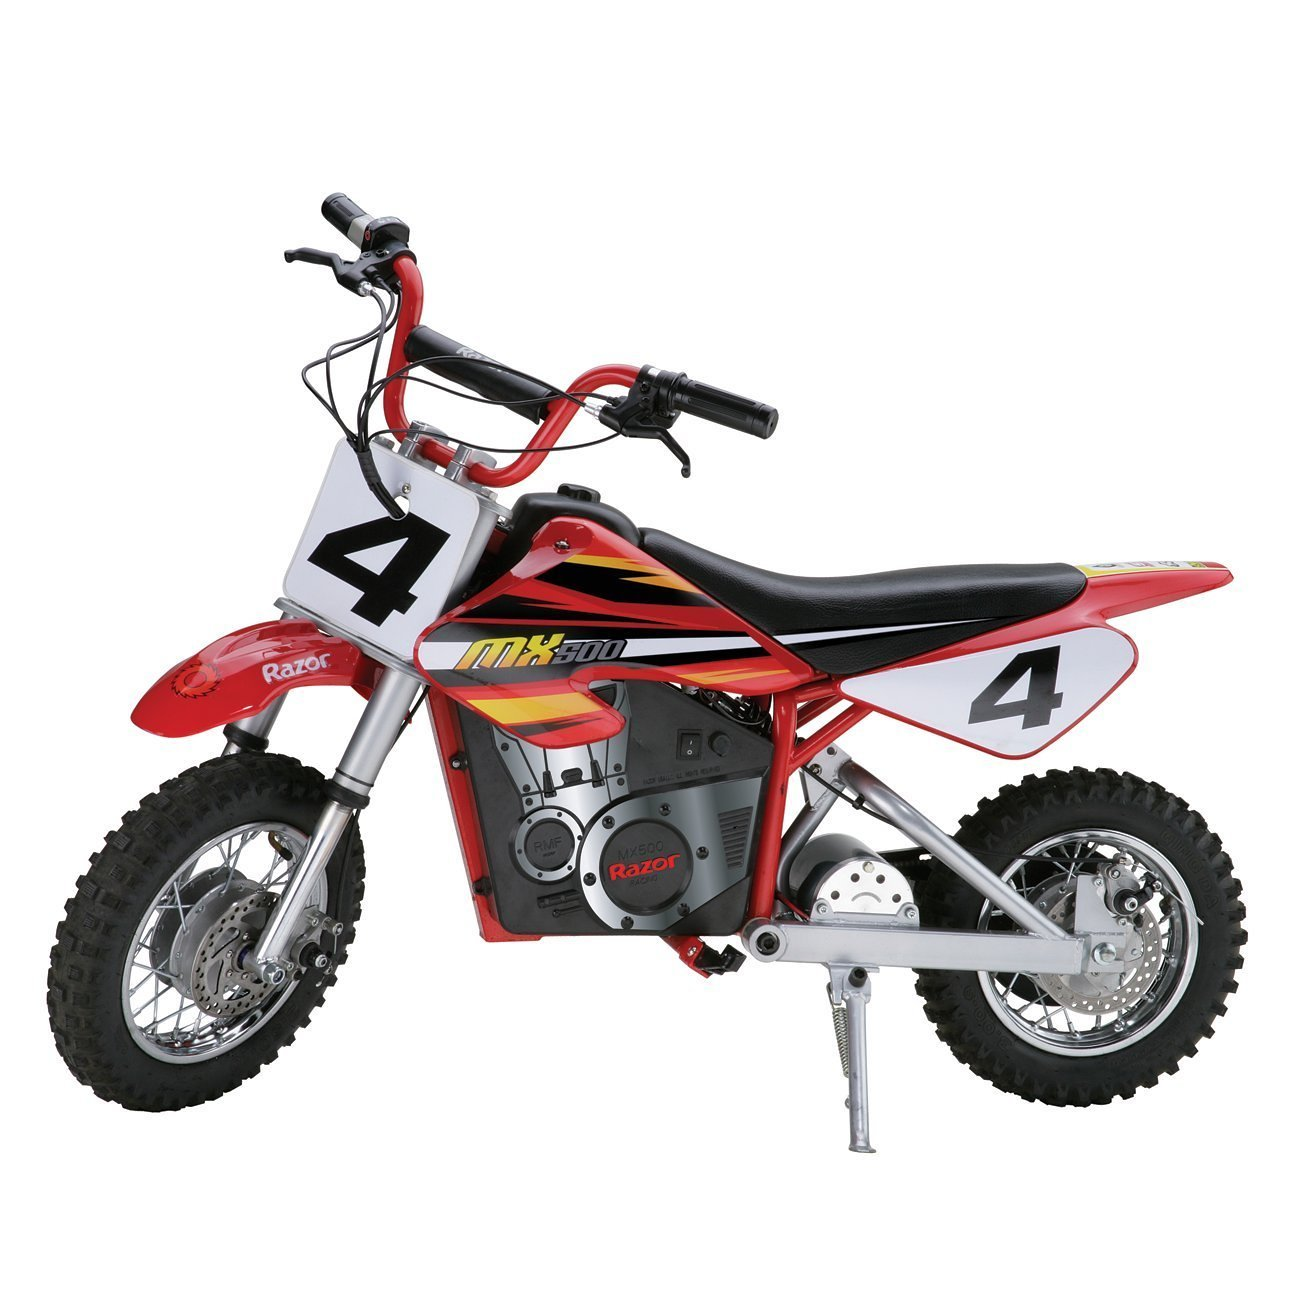 Razor MX500 Motocross e-bike